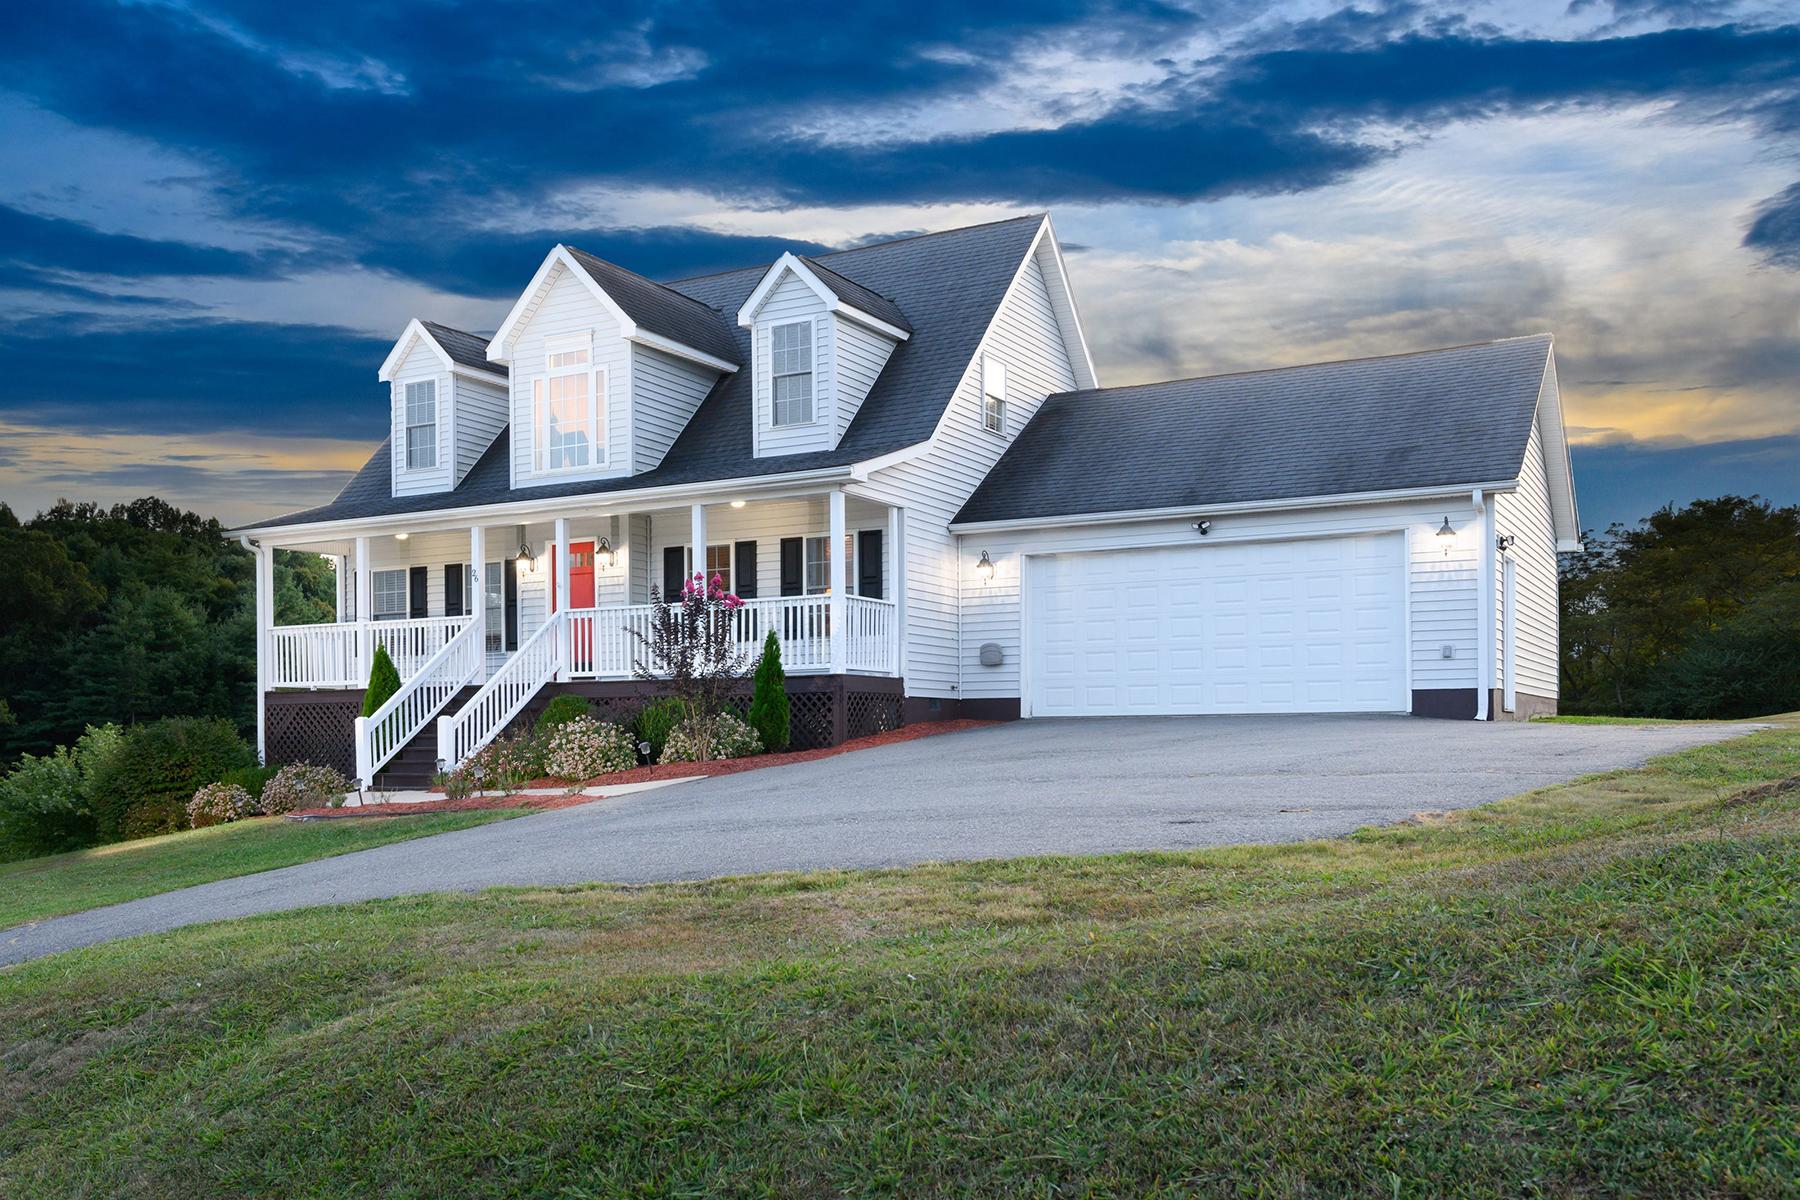 Single Family Homes vì Bán tại CASTLEWOOD ESTATES 26 Castlewood Dr, Alexander, Bắc Carolina 28701 Hoa Kỳ